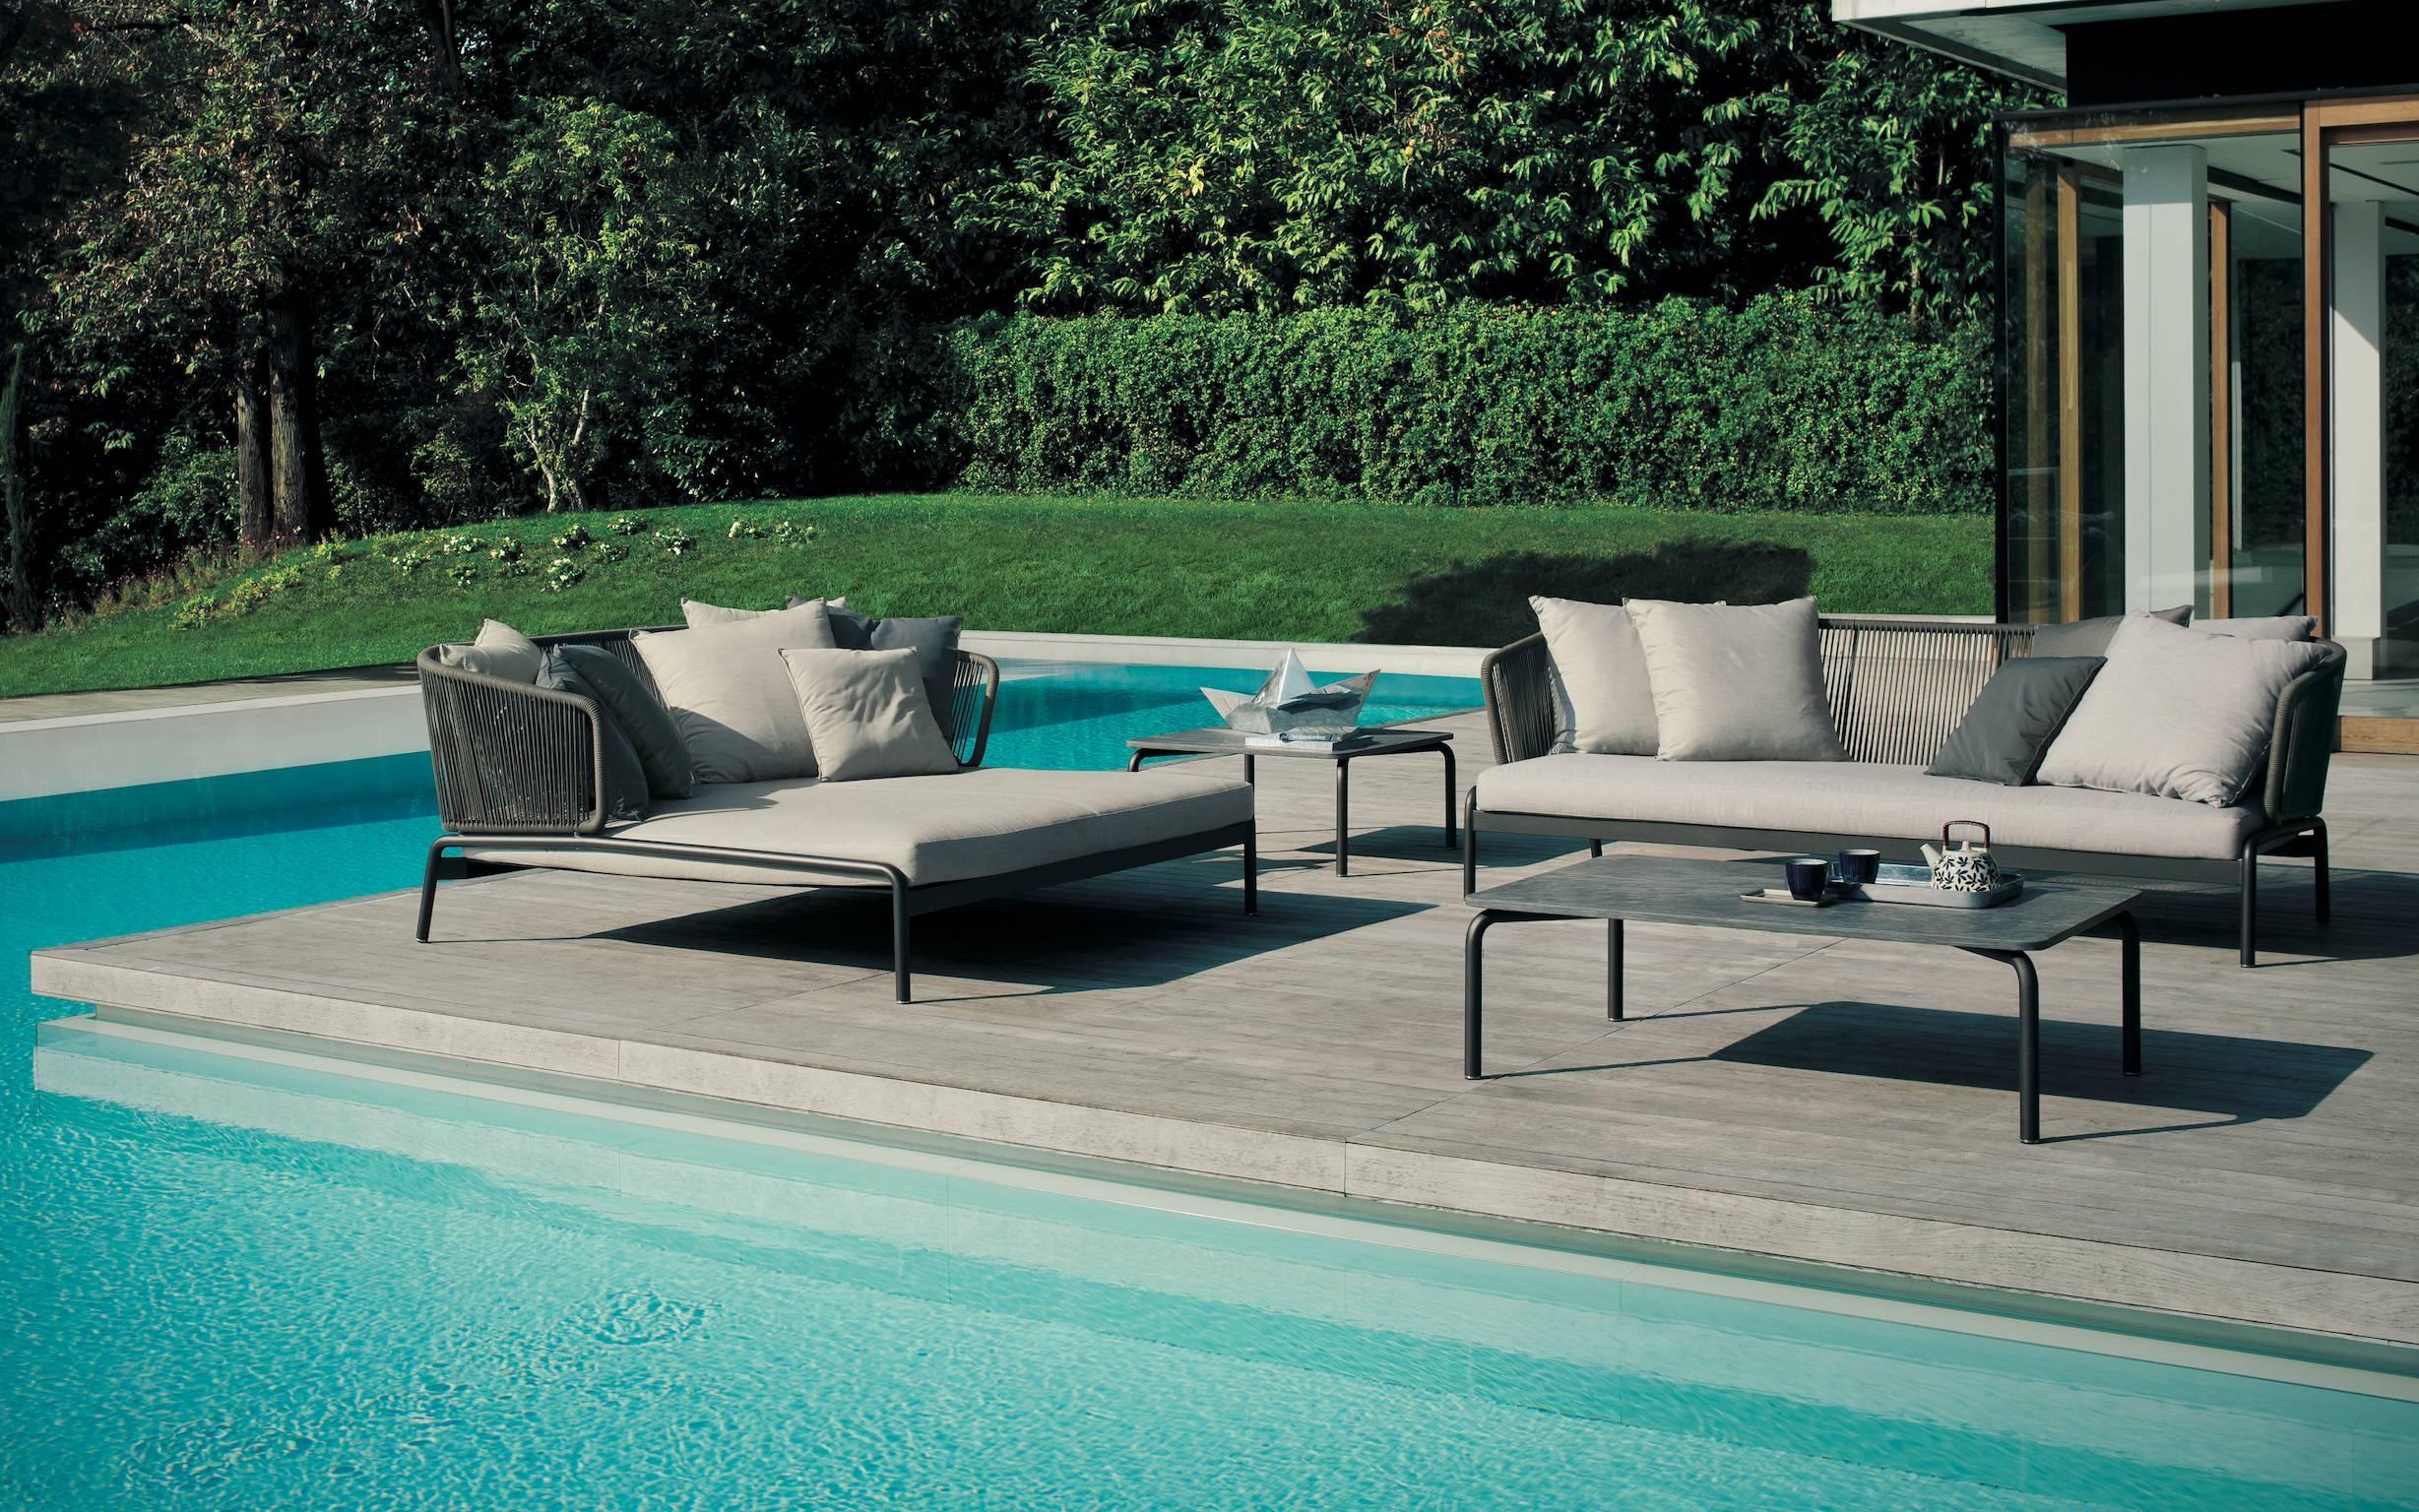 Powder Coated RODA Spool Three Seat Sofa For Outdoor/Indoor Use By Rodolfo